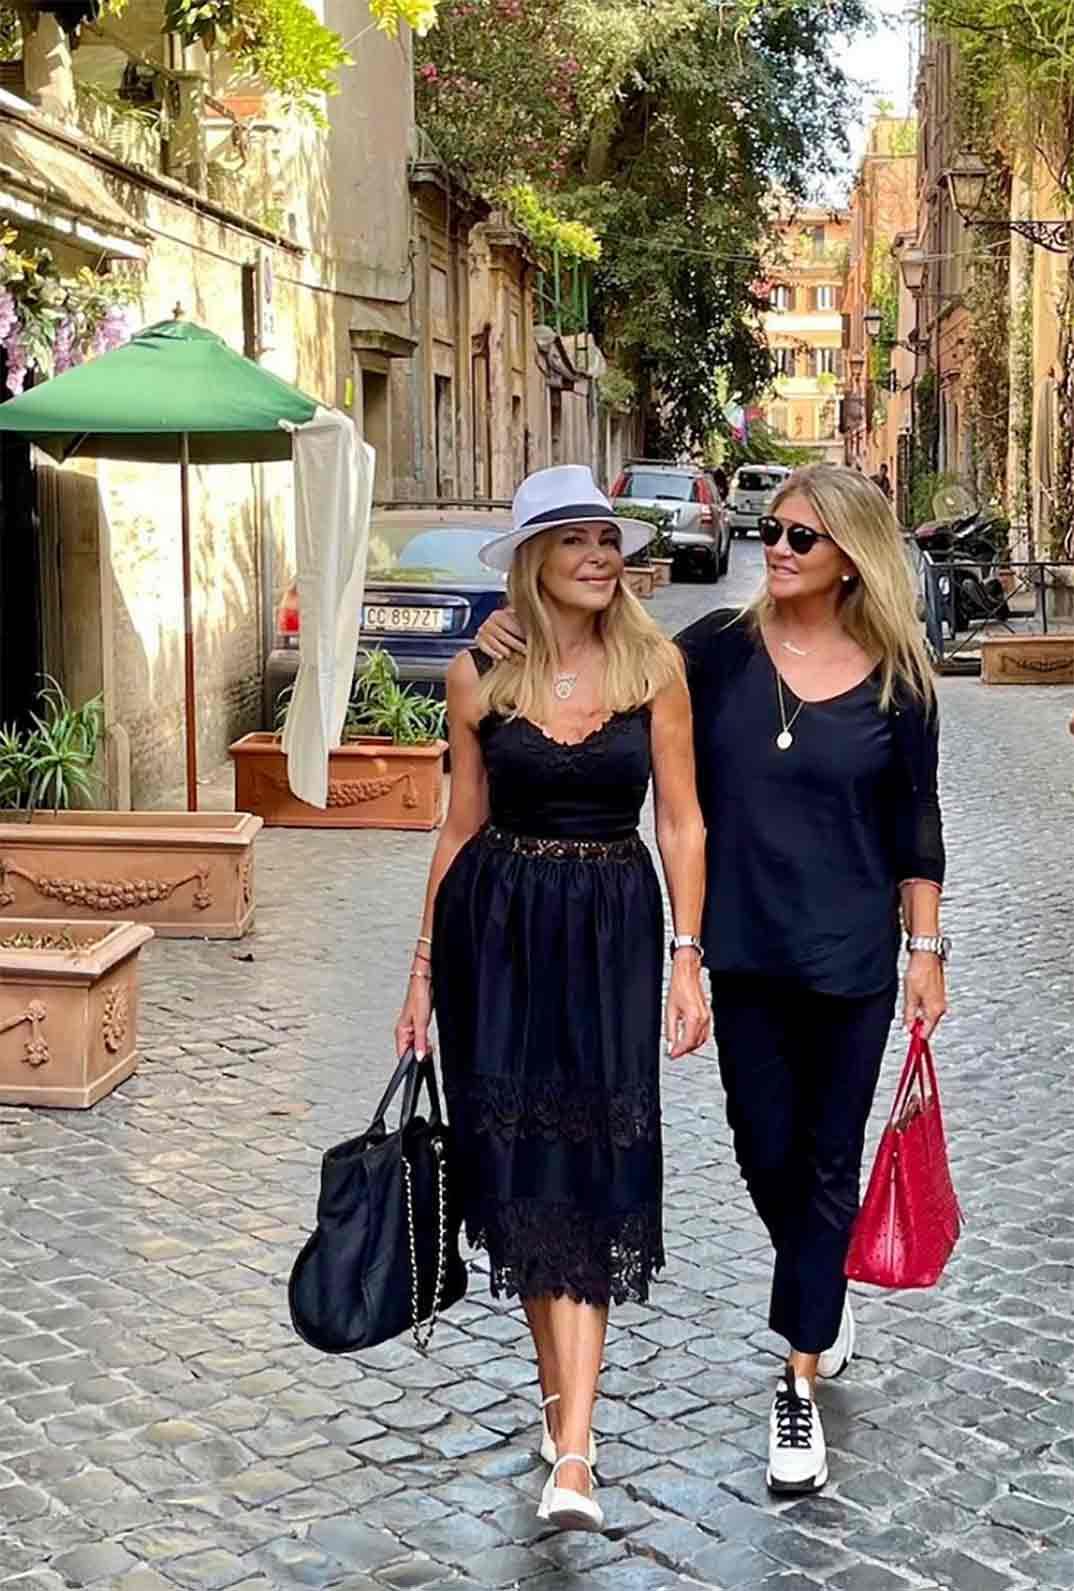 Ana Obregón y Susana Uribarri © Instagram